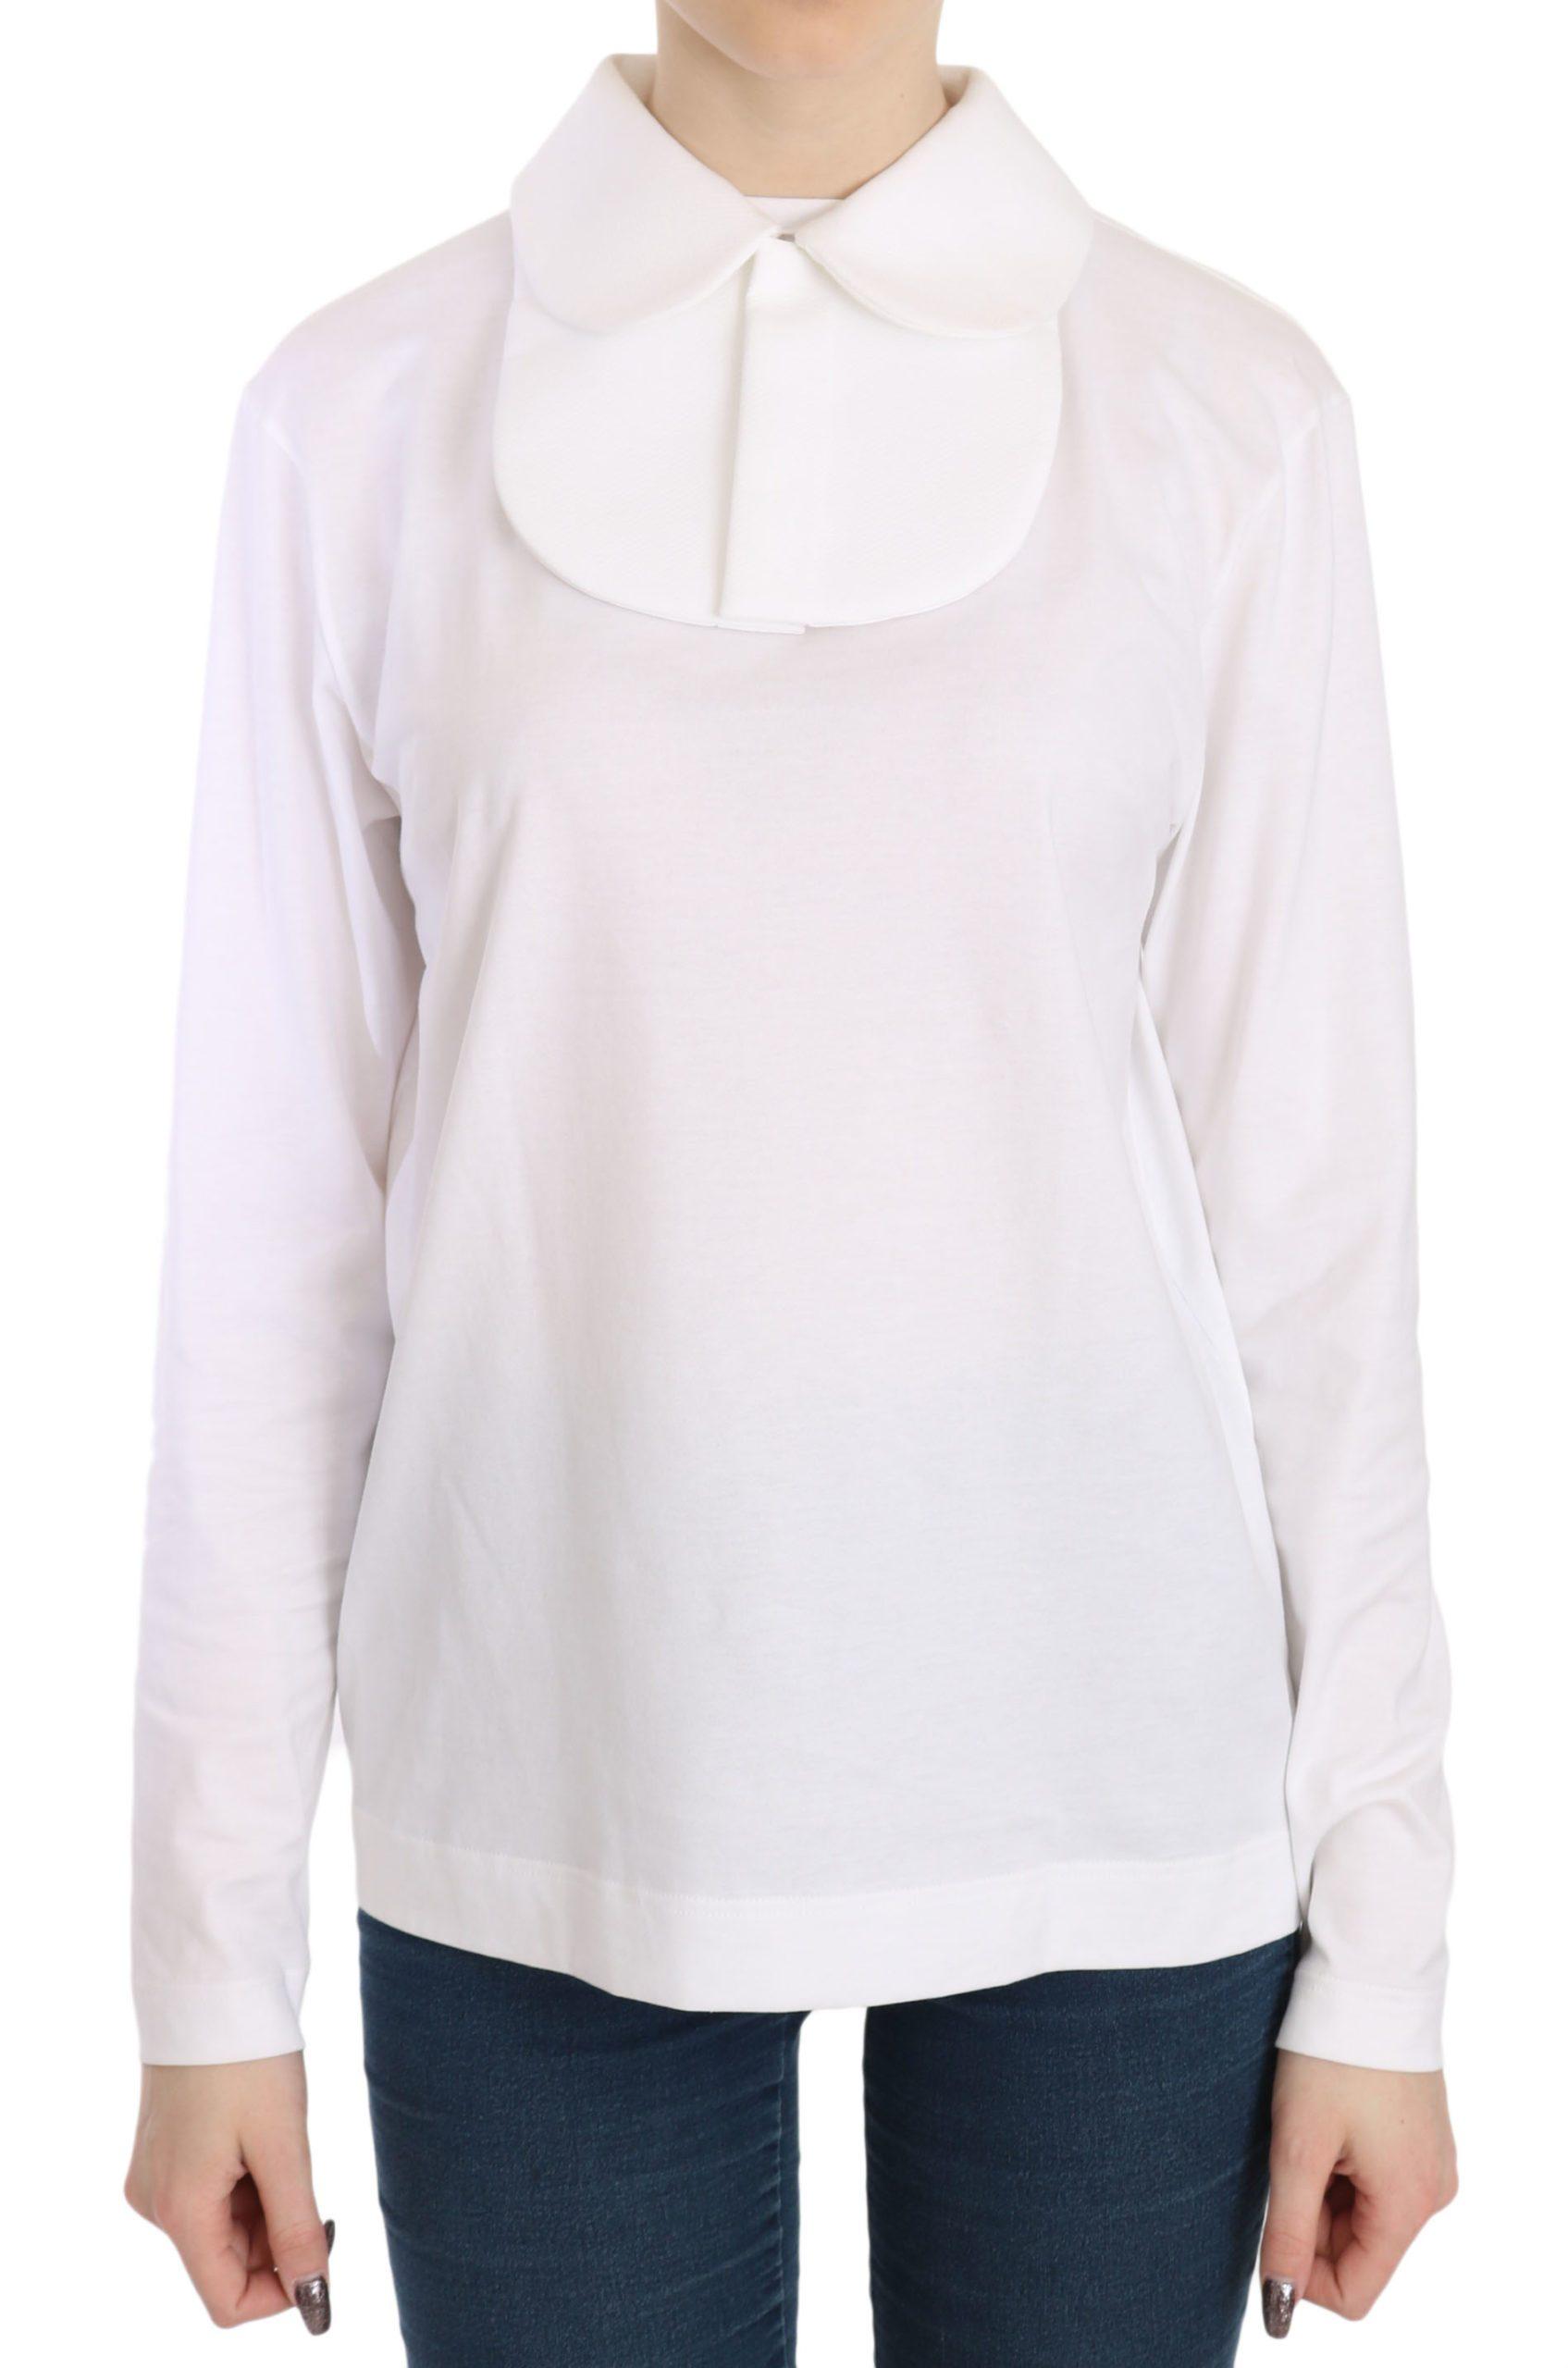 Dolce & Gabbana Women's LS Collared Top White TSH3657 - IT40 S